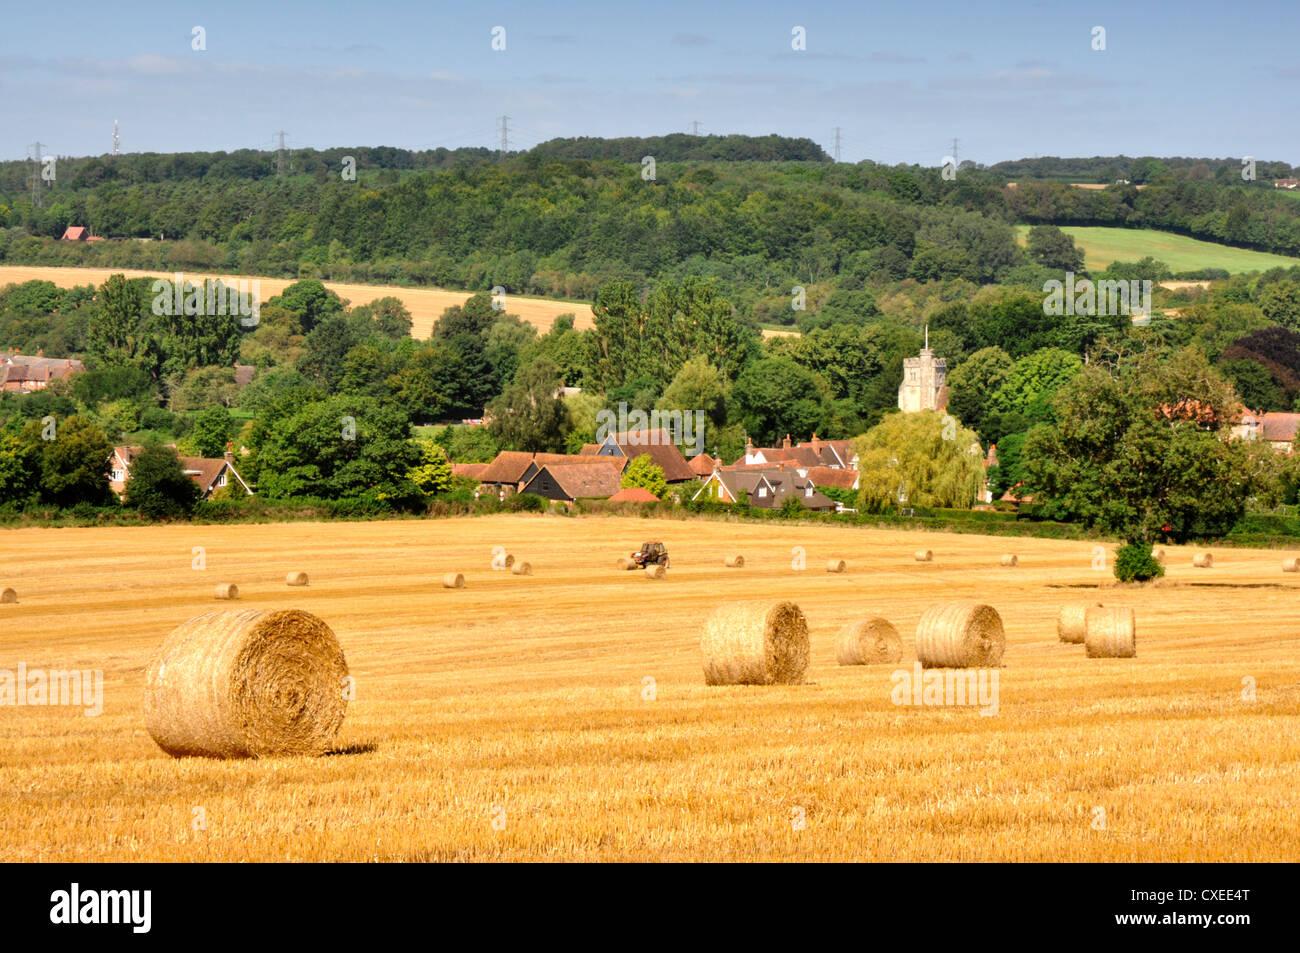 Chiltern Hills Buckinghamshire - harvested field - golden stubble and straw bales -autumn sunlight - backdrop Little - Stock Image